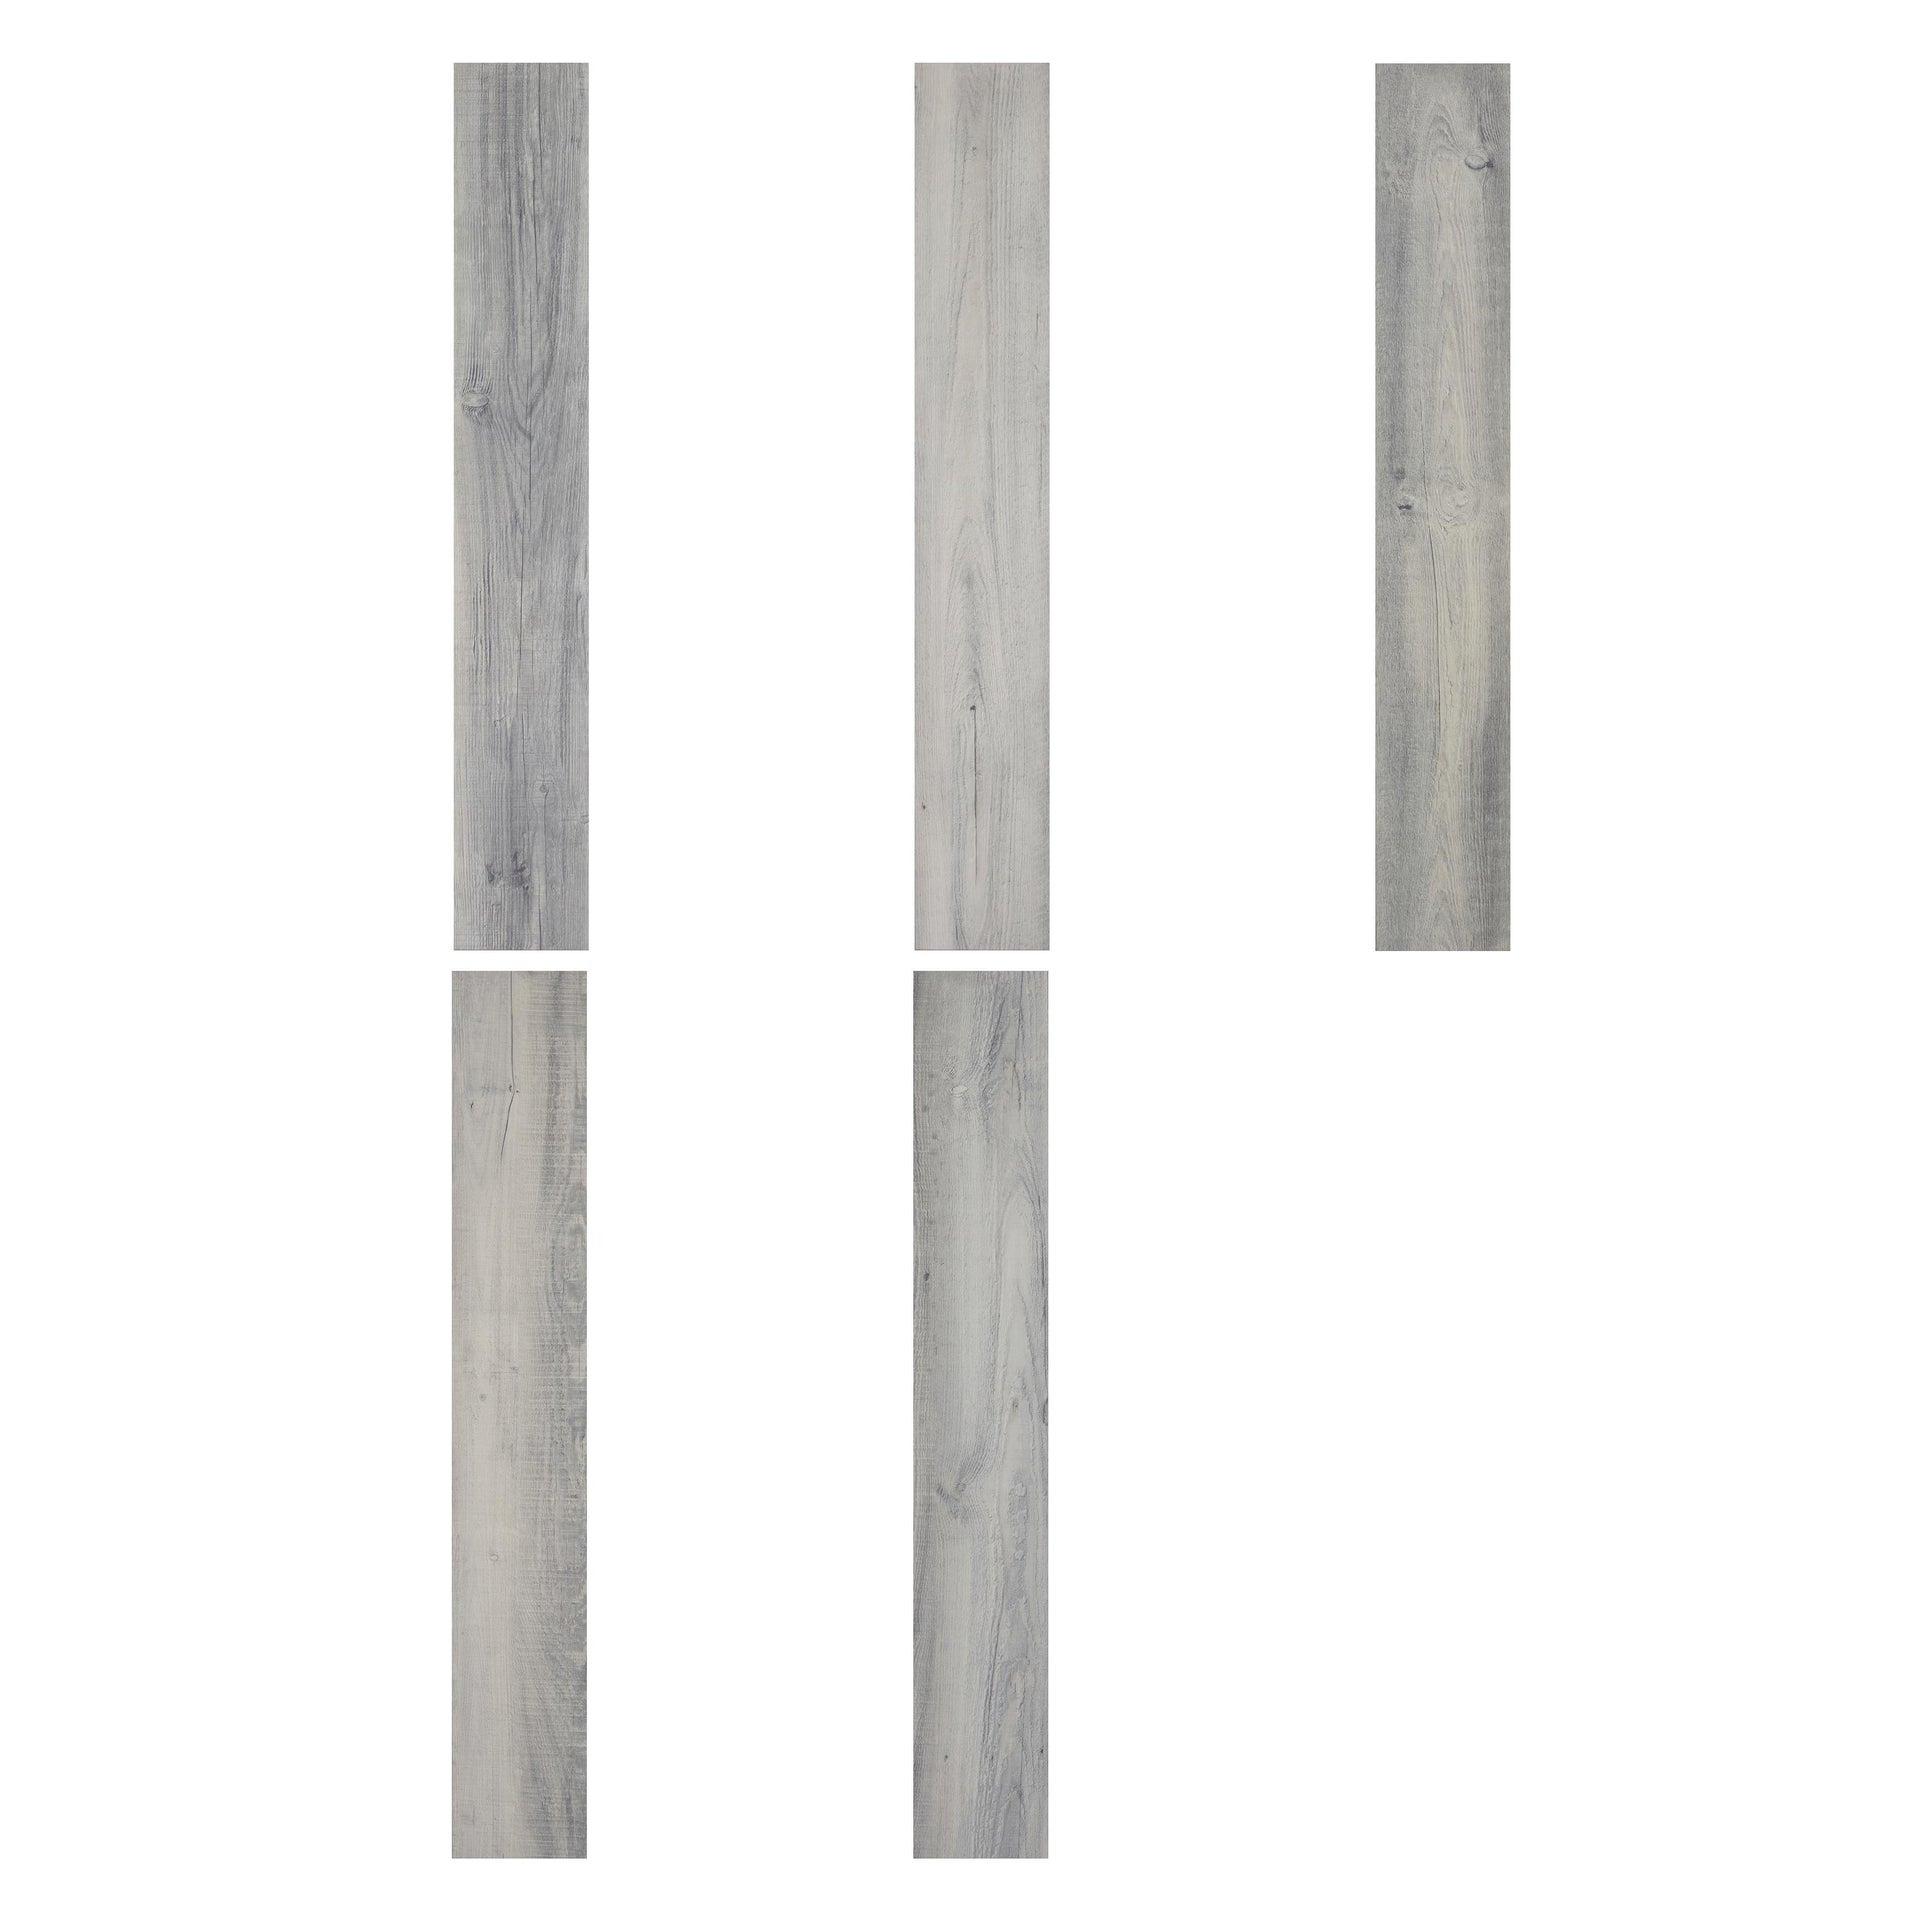 Plancia di vinile flottante clic+ Solor Sp 5 mm grigio / argento - 5